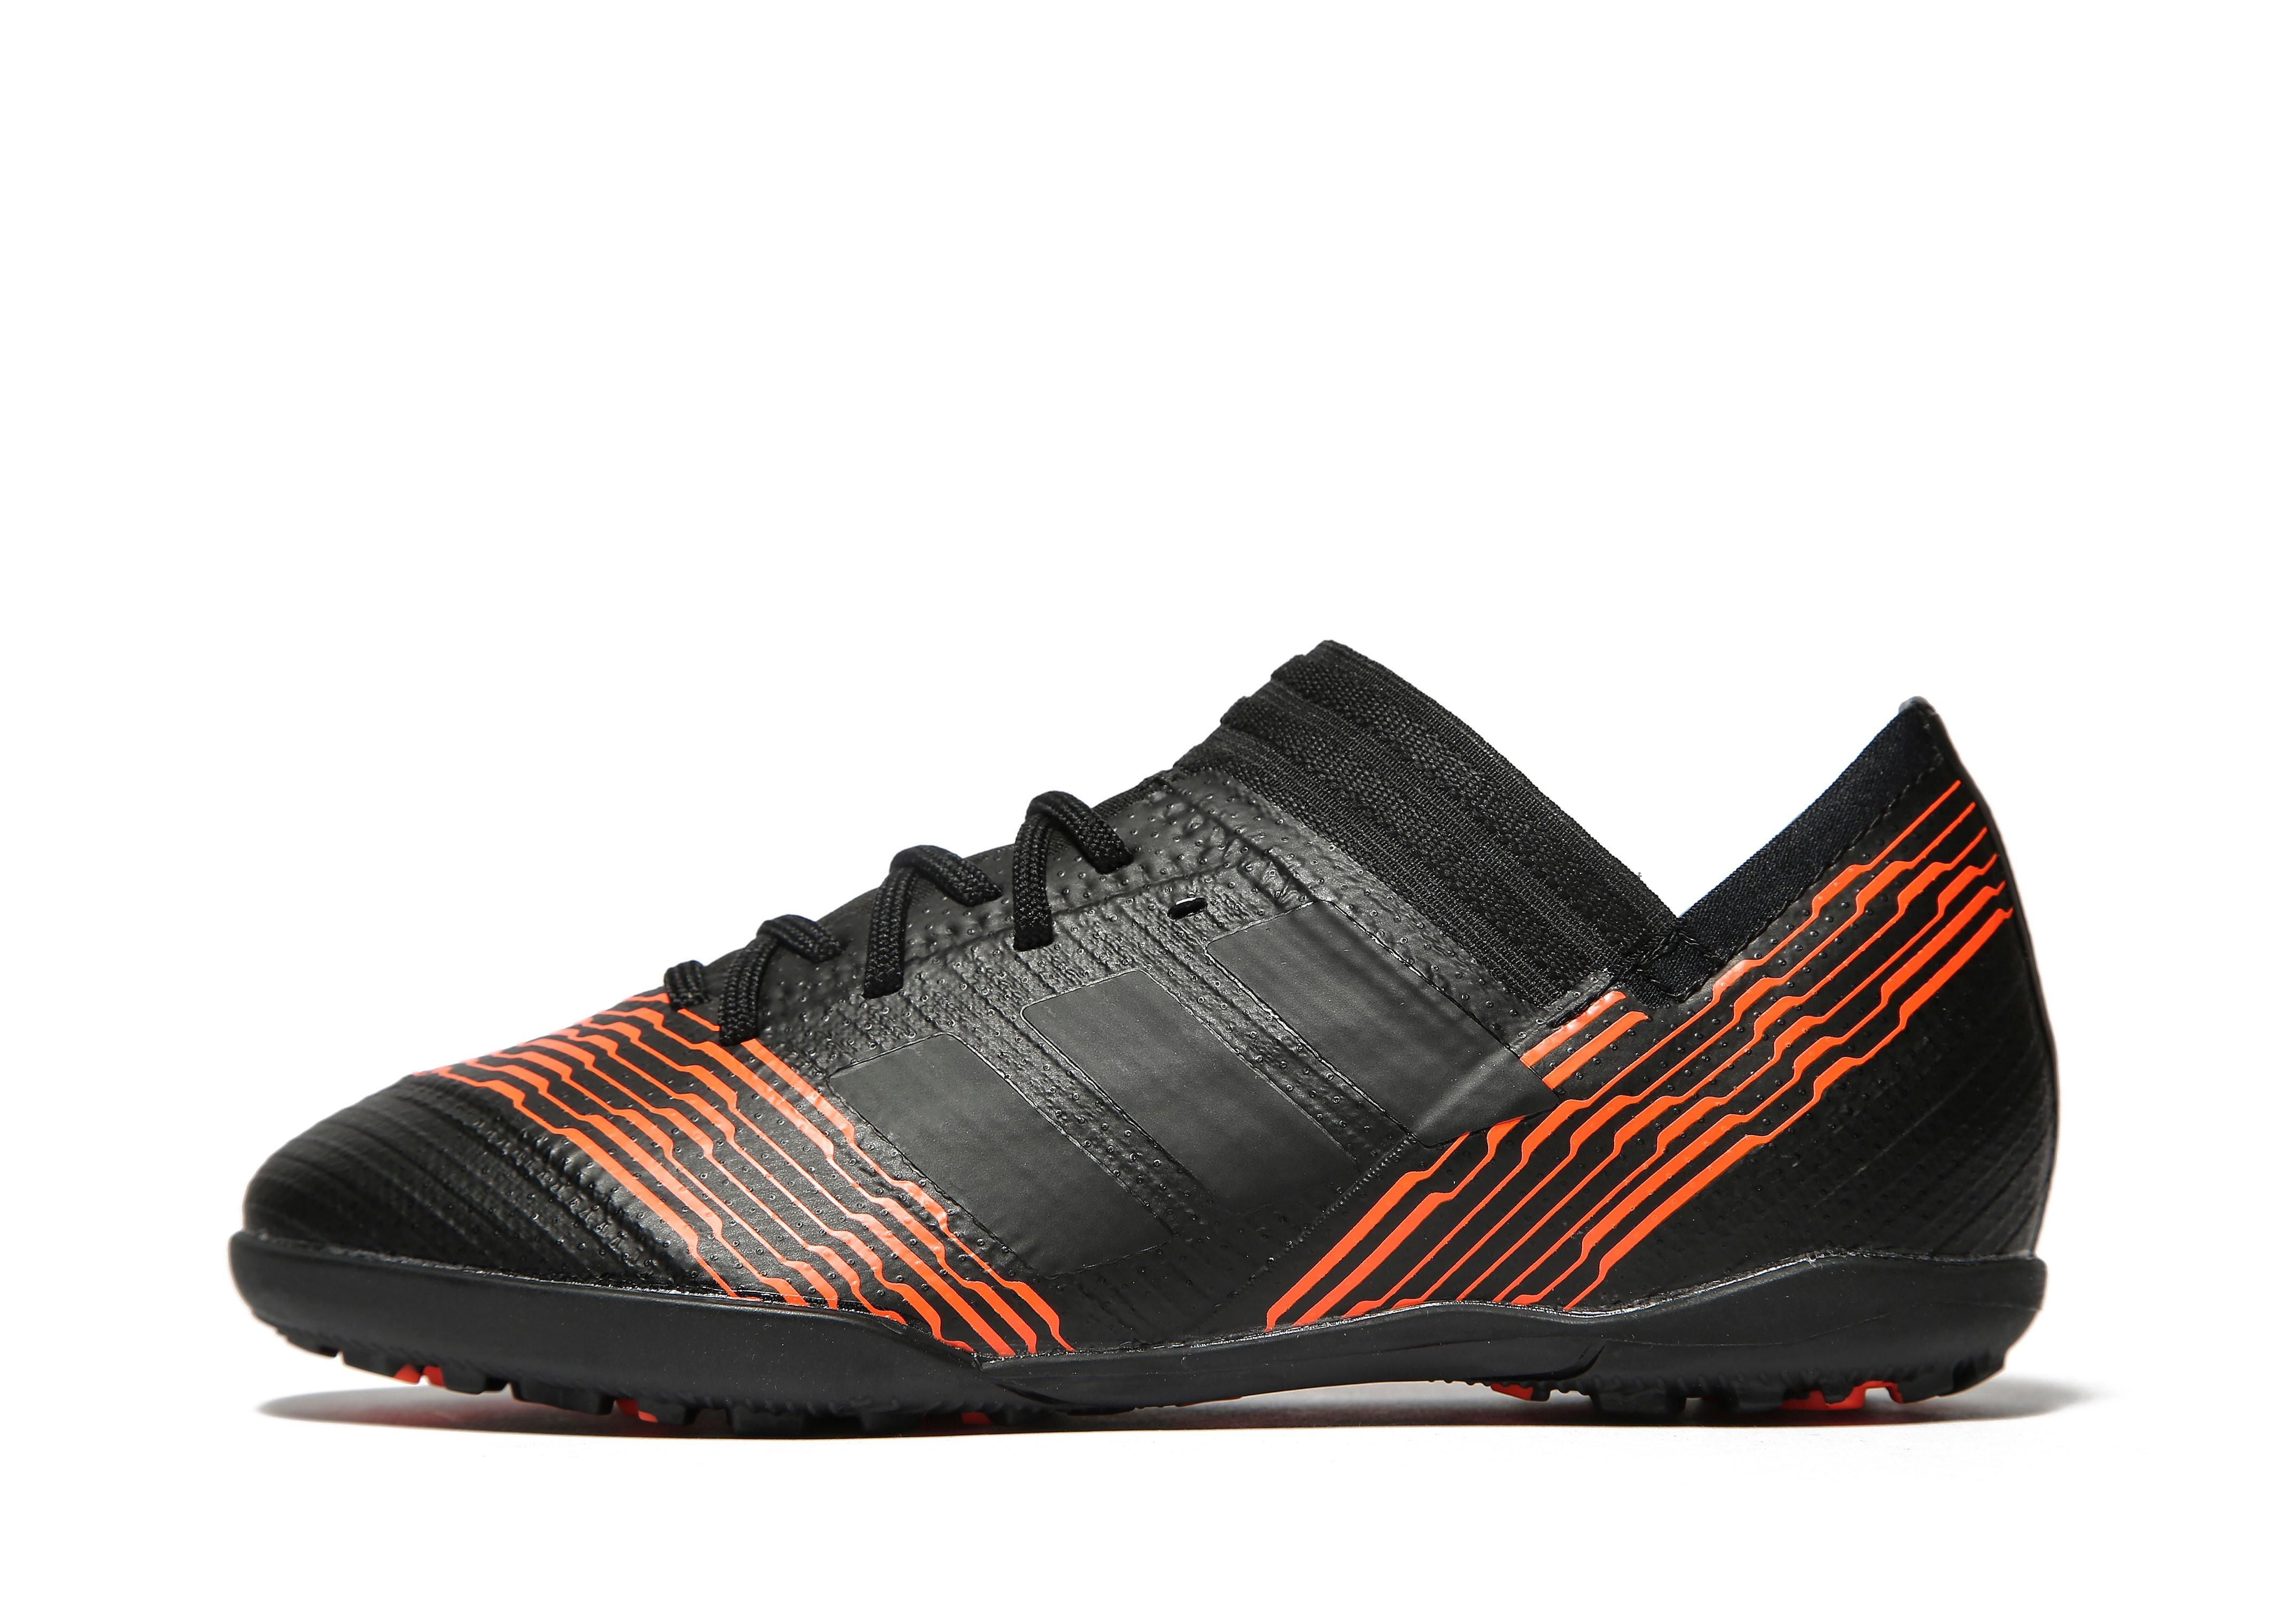 adidas SkyStalker Nemeziz 17.3 TF Children